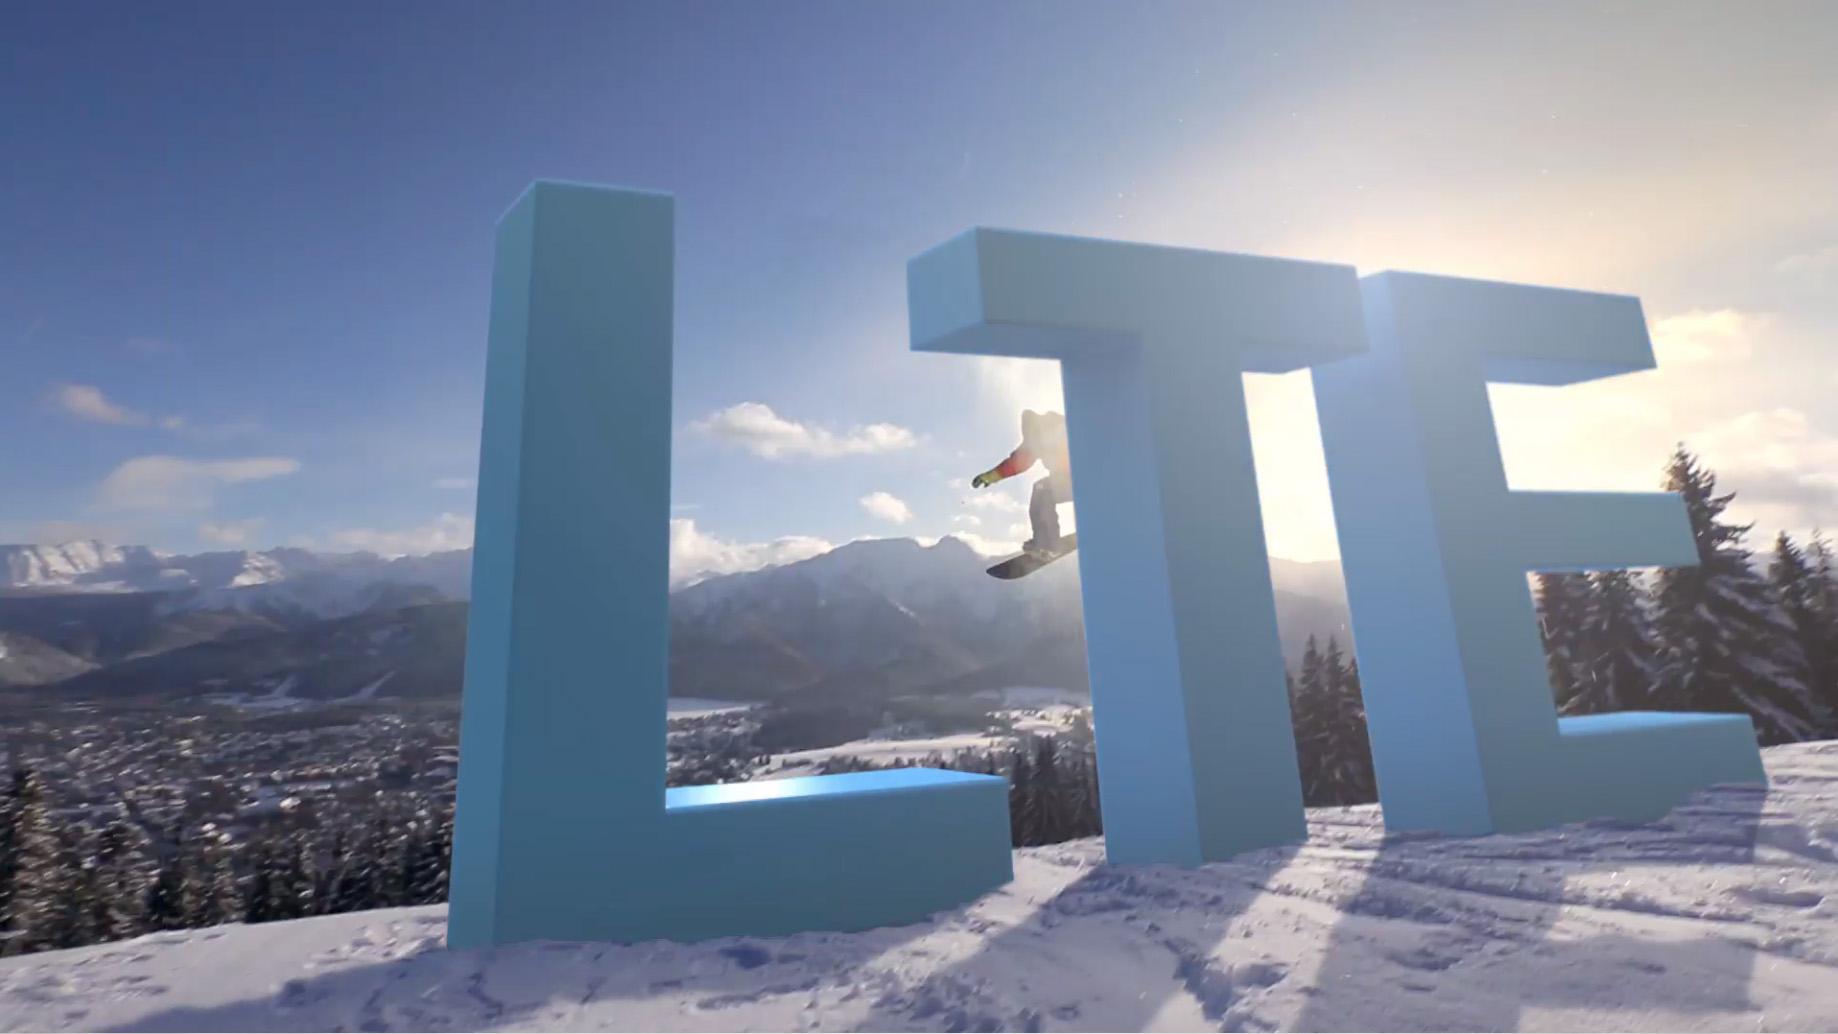 CP_LTE_Snowboard